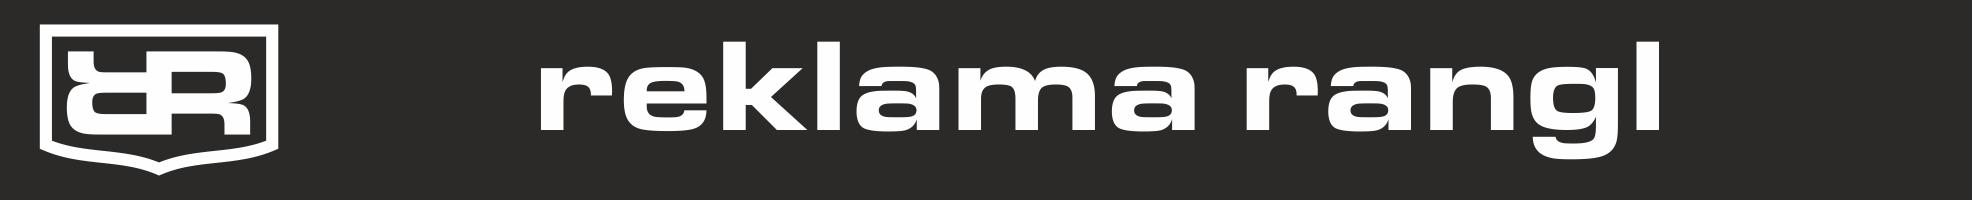 Reklama Rangl logo